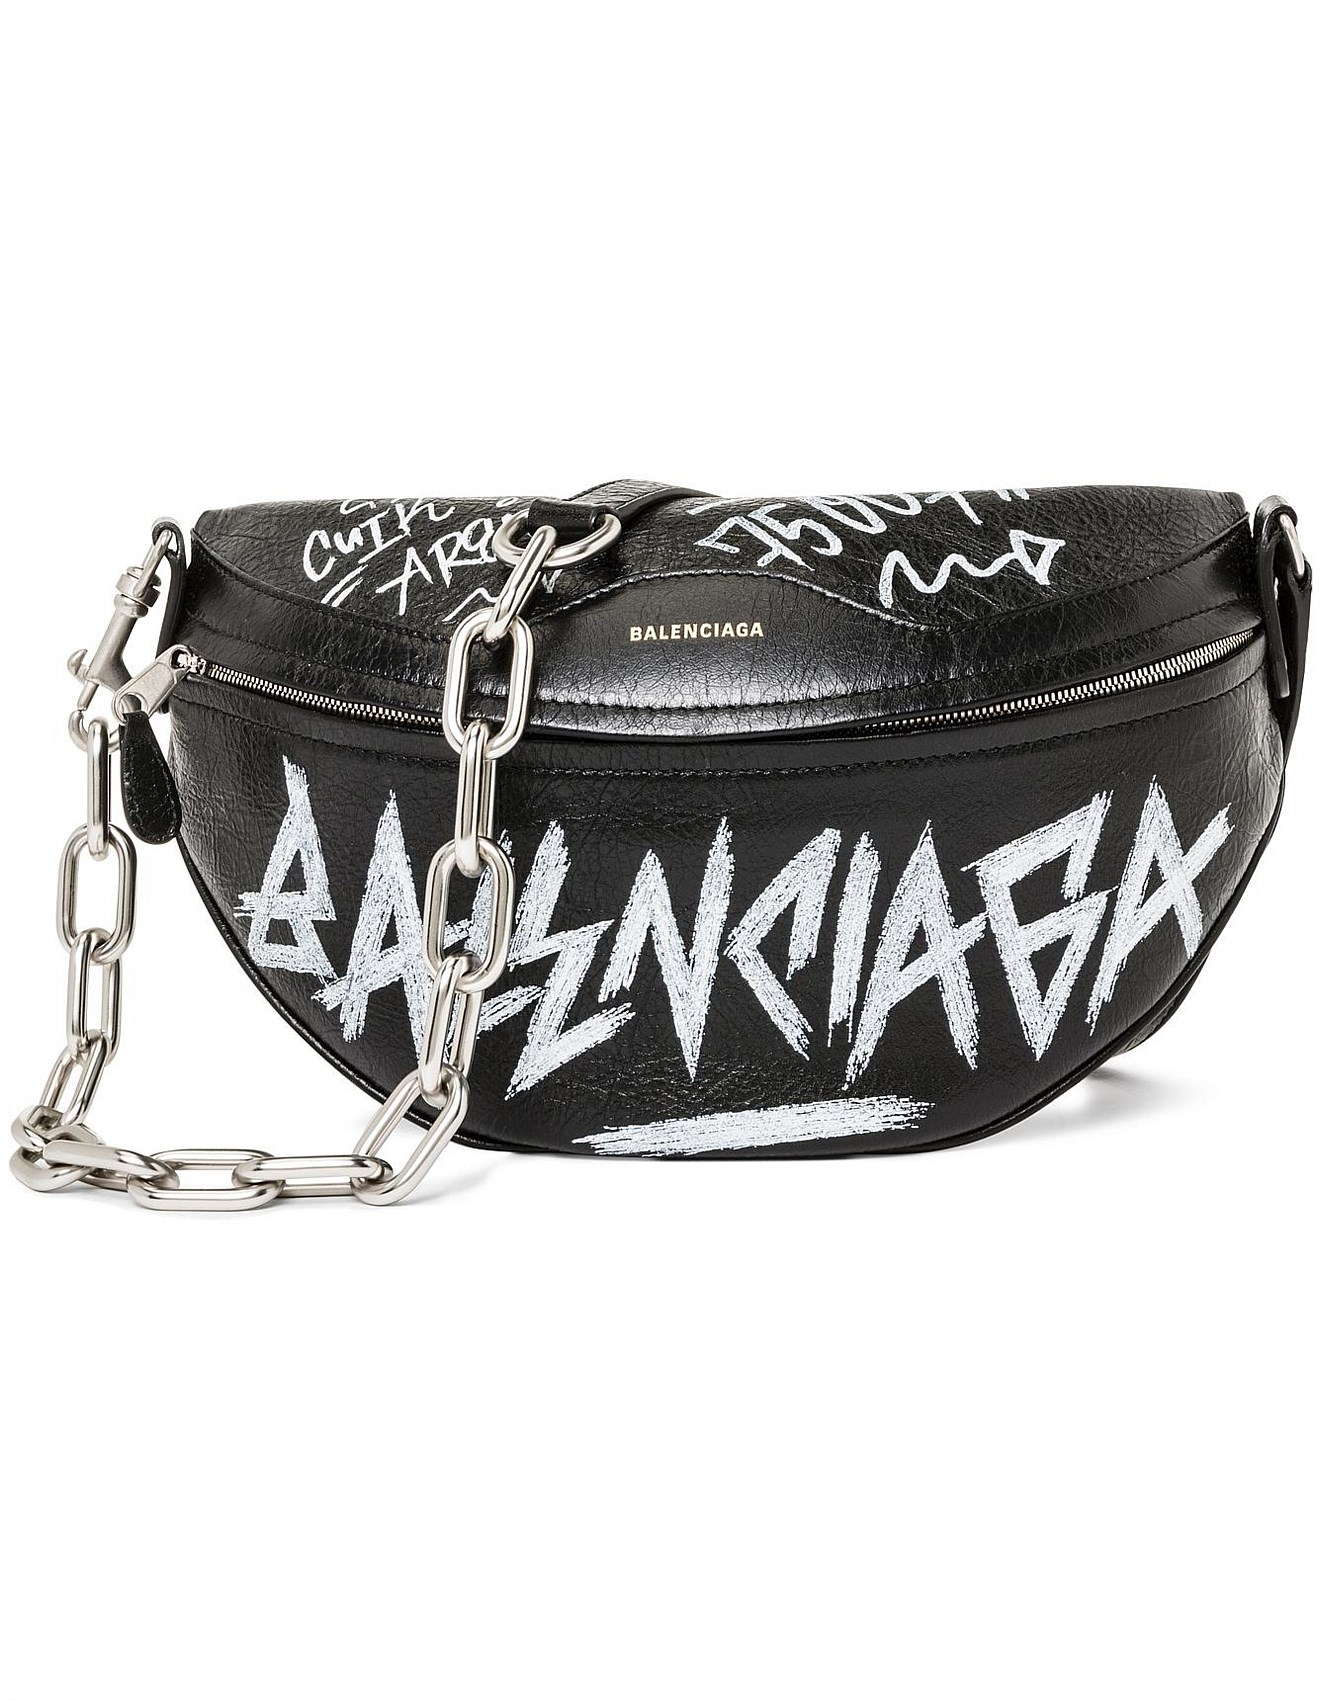 Designer Handbags Bags Online David Jones Graffiti Souvenir Bag Ax Aj